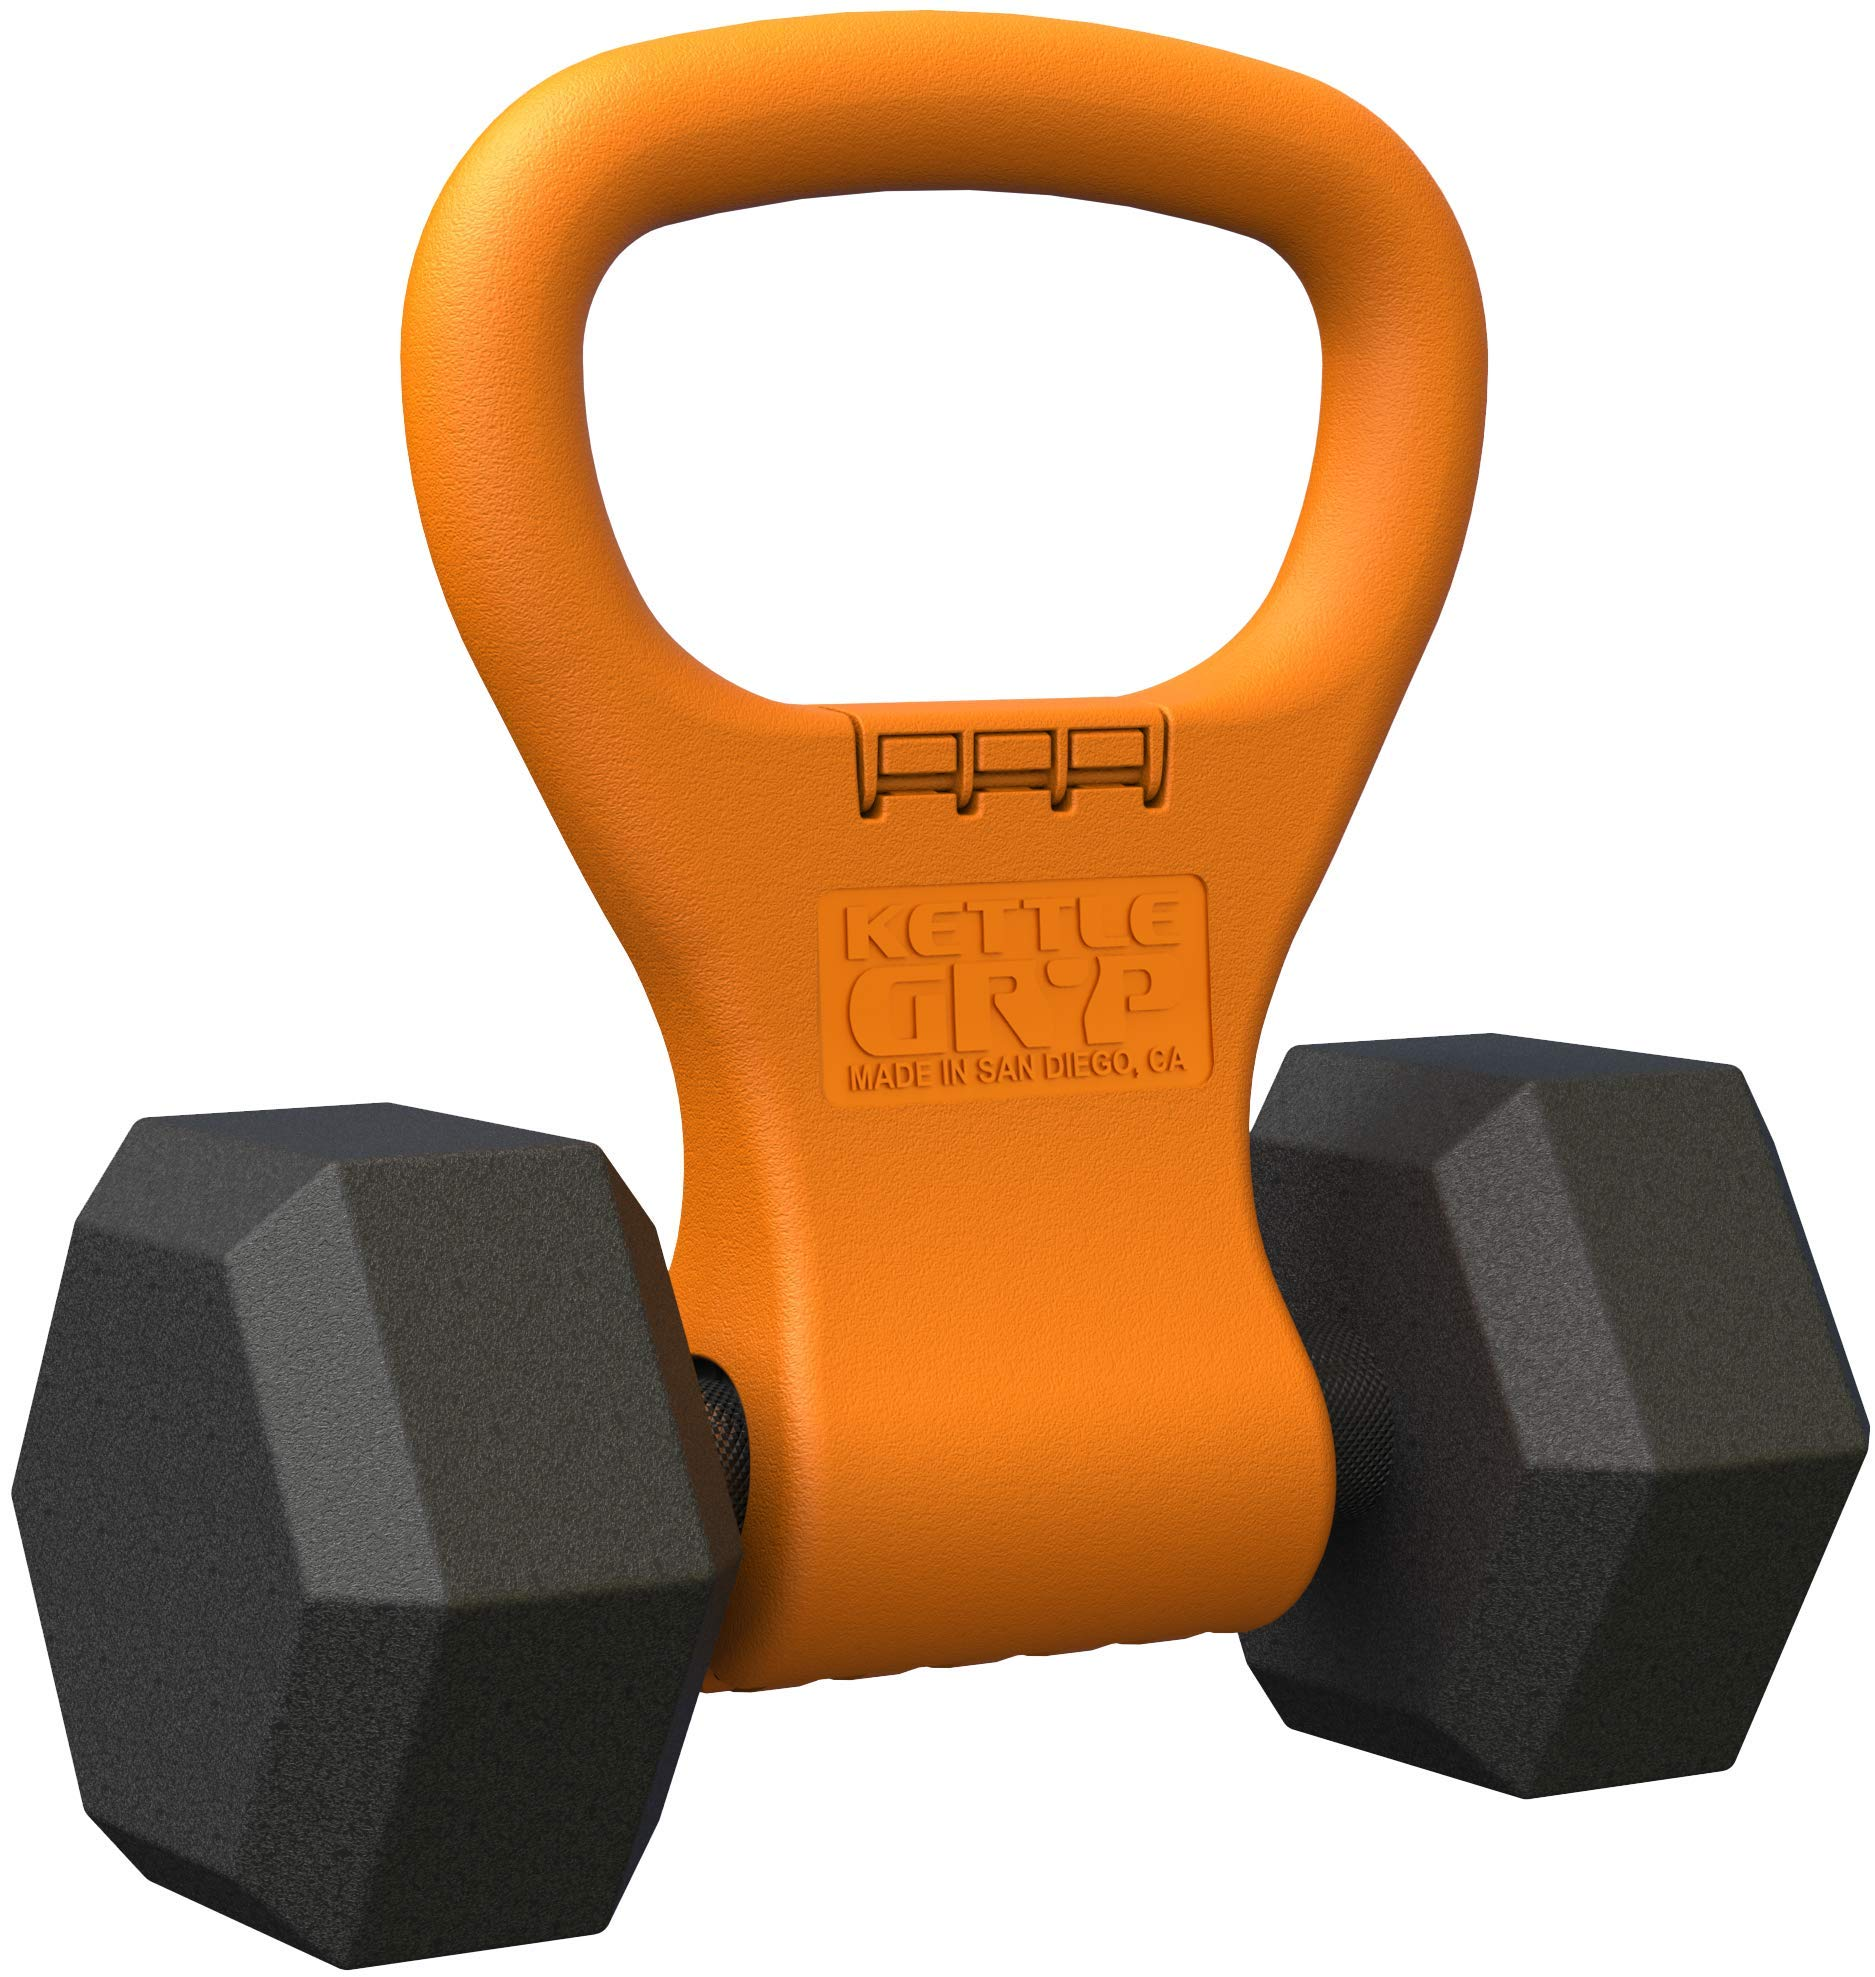 Kettle Gryp Weightlifting Bodybuilding U S